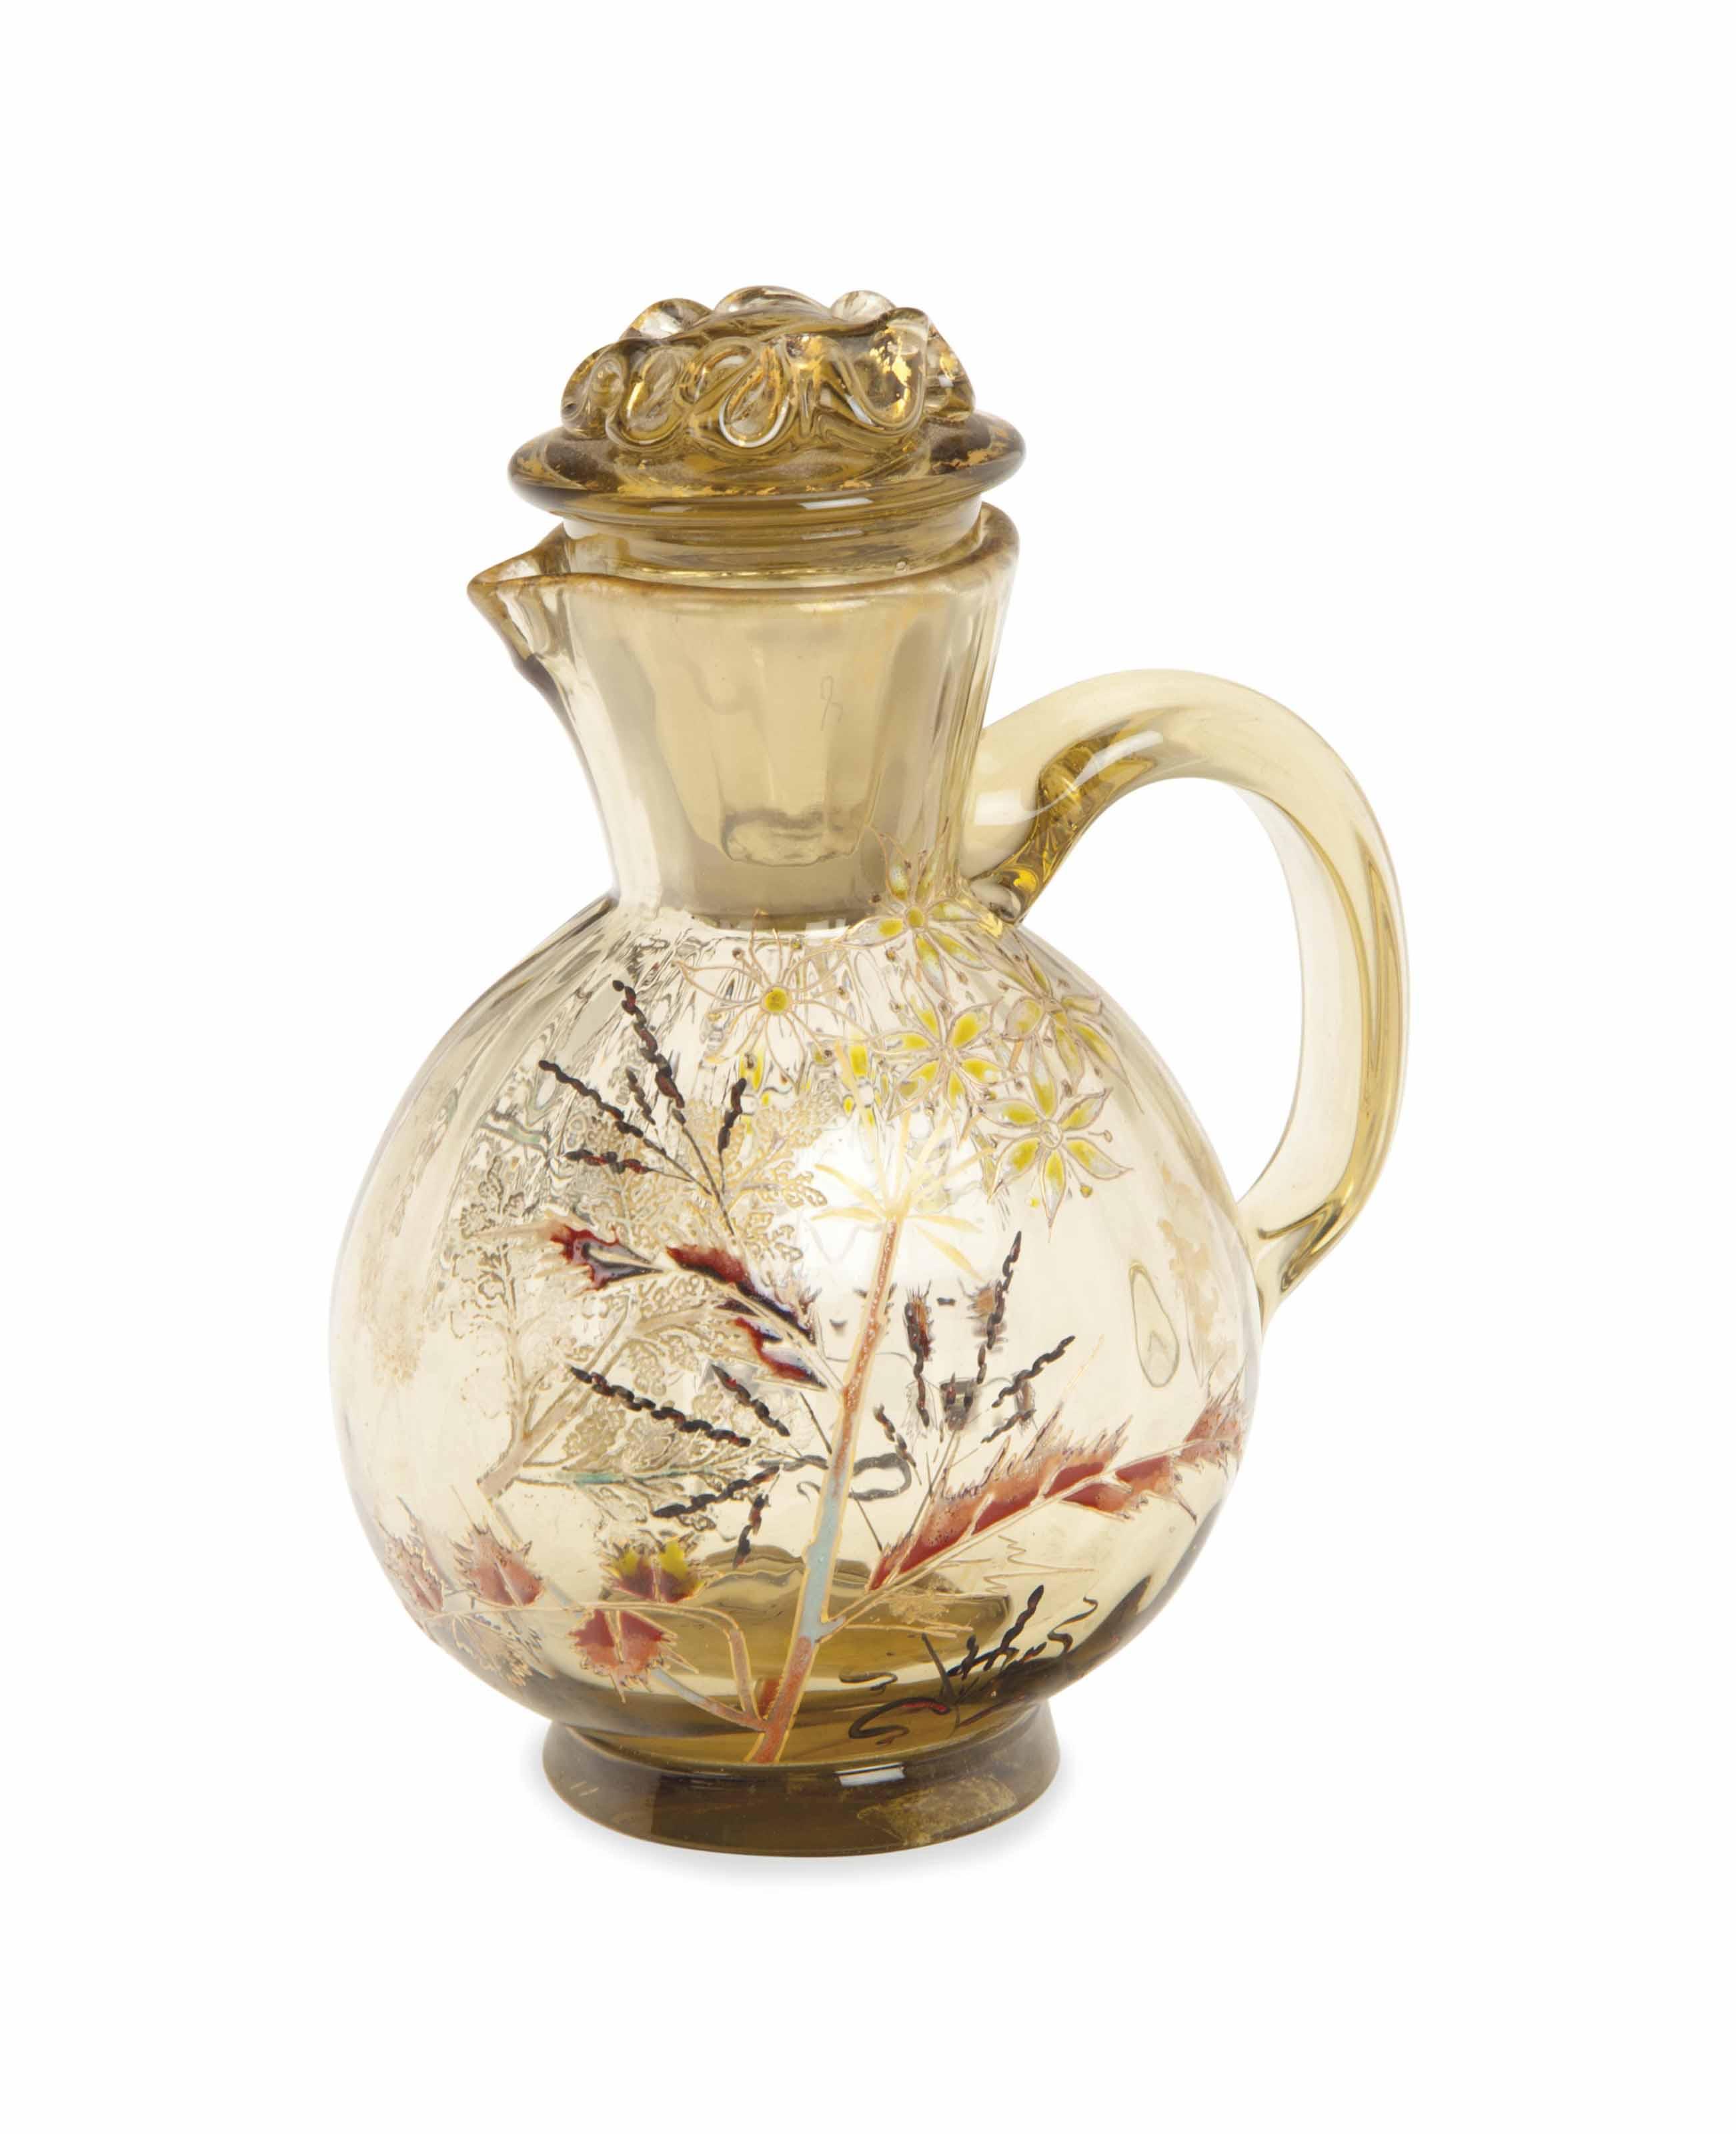 A FRENCH ENAMELED GLASS CRUET,